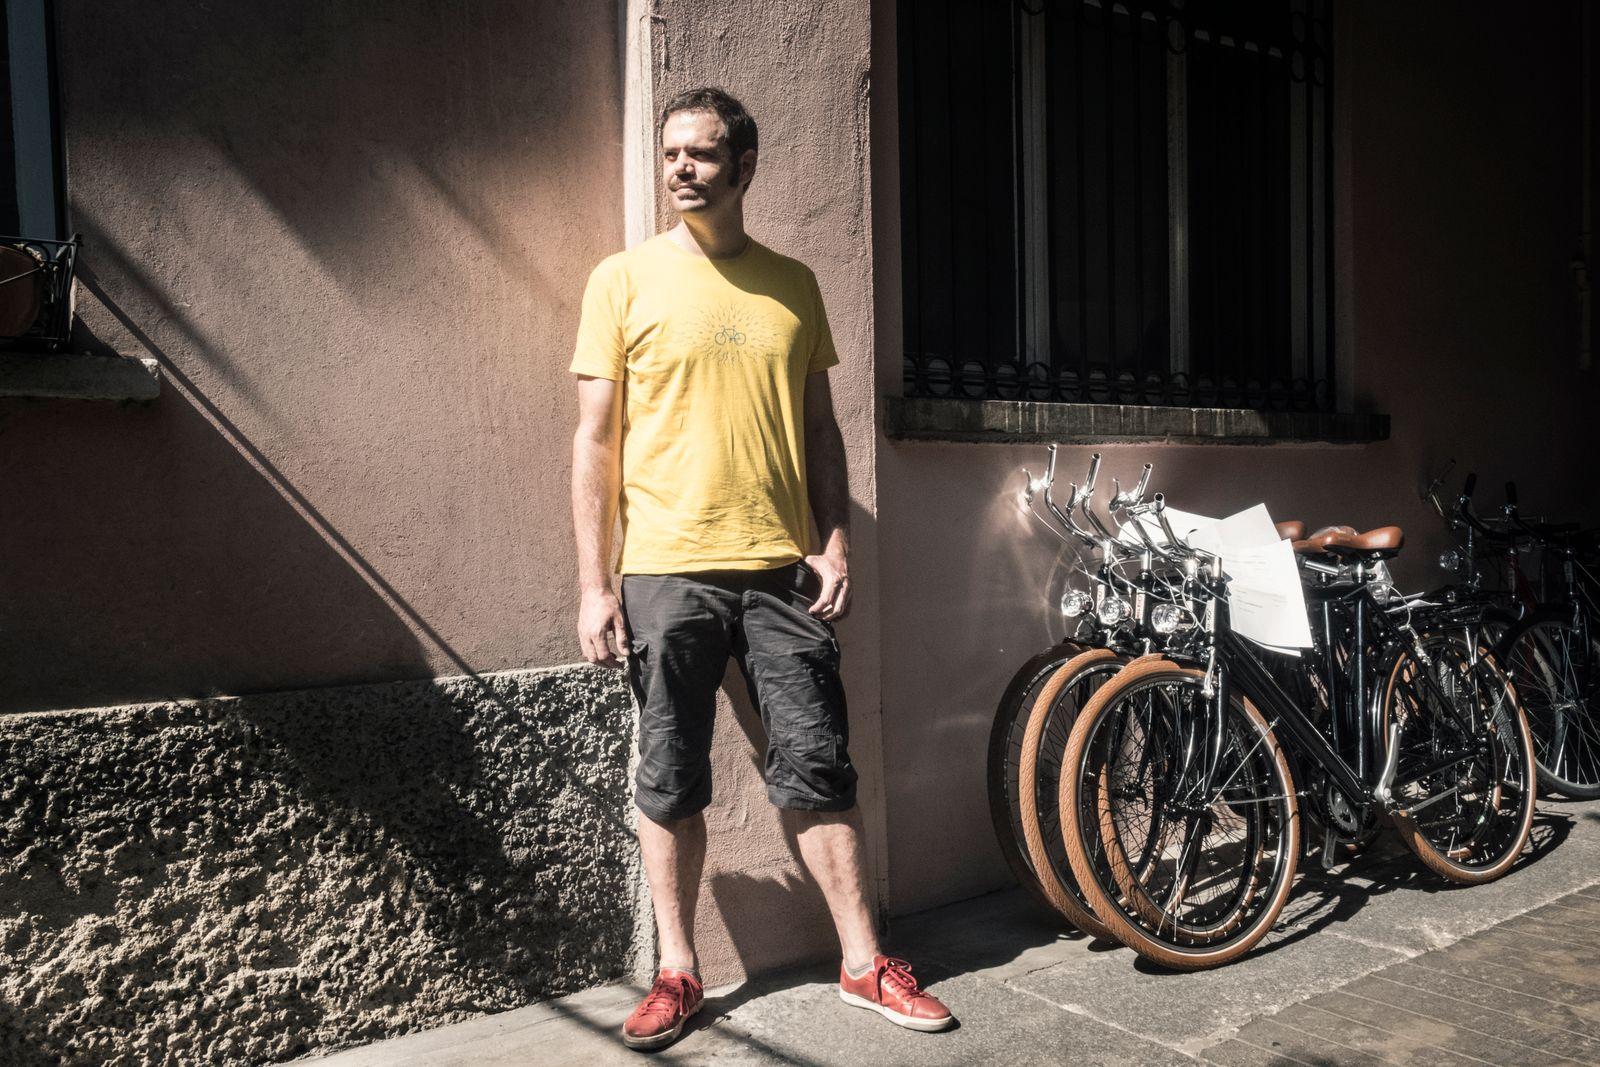 milano bike_04